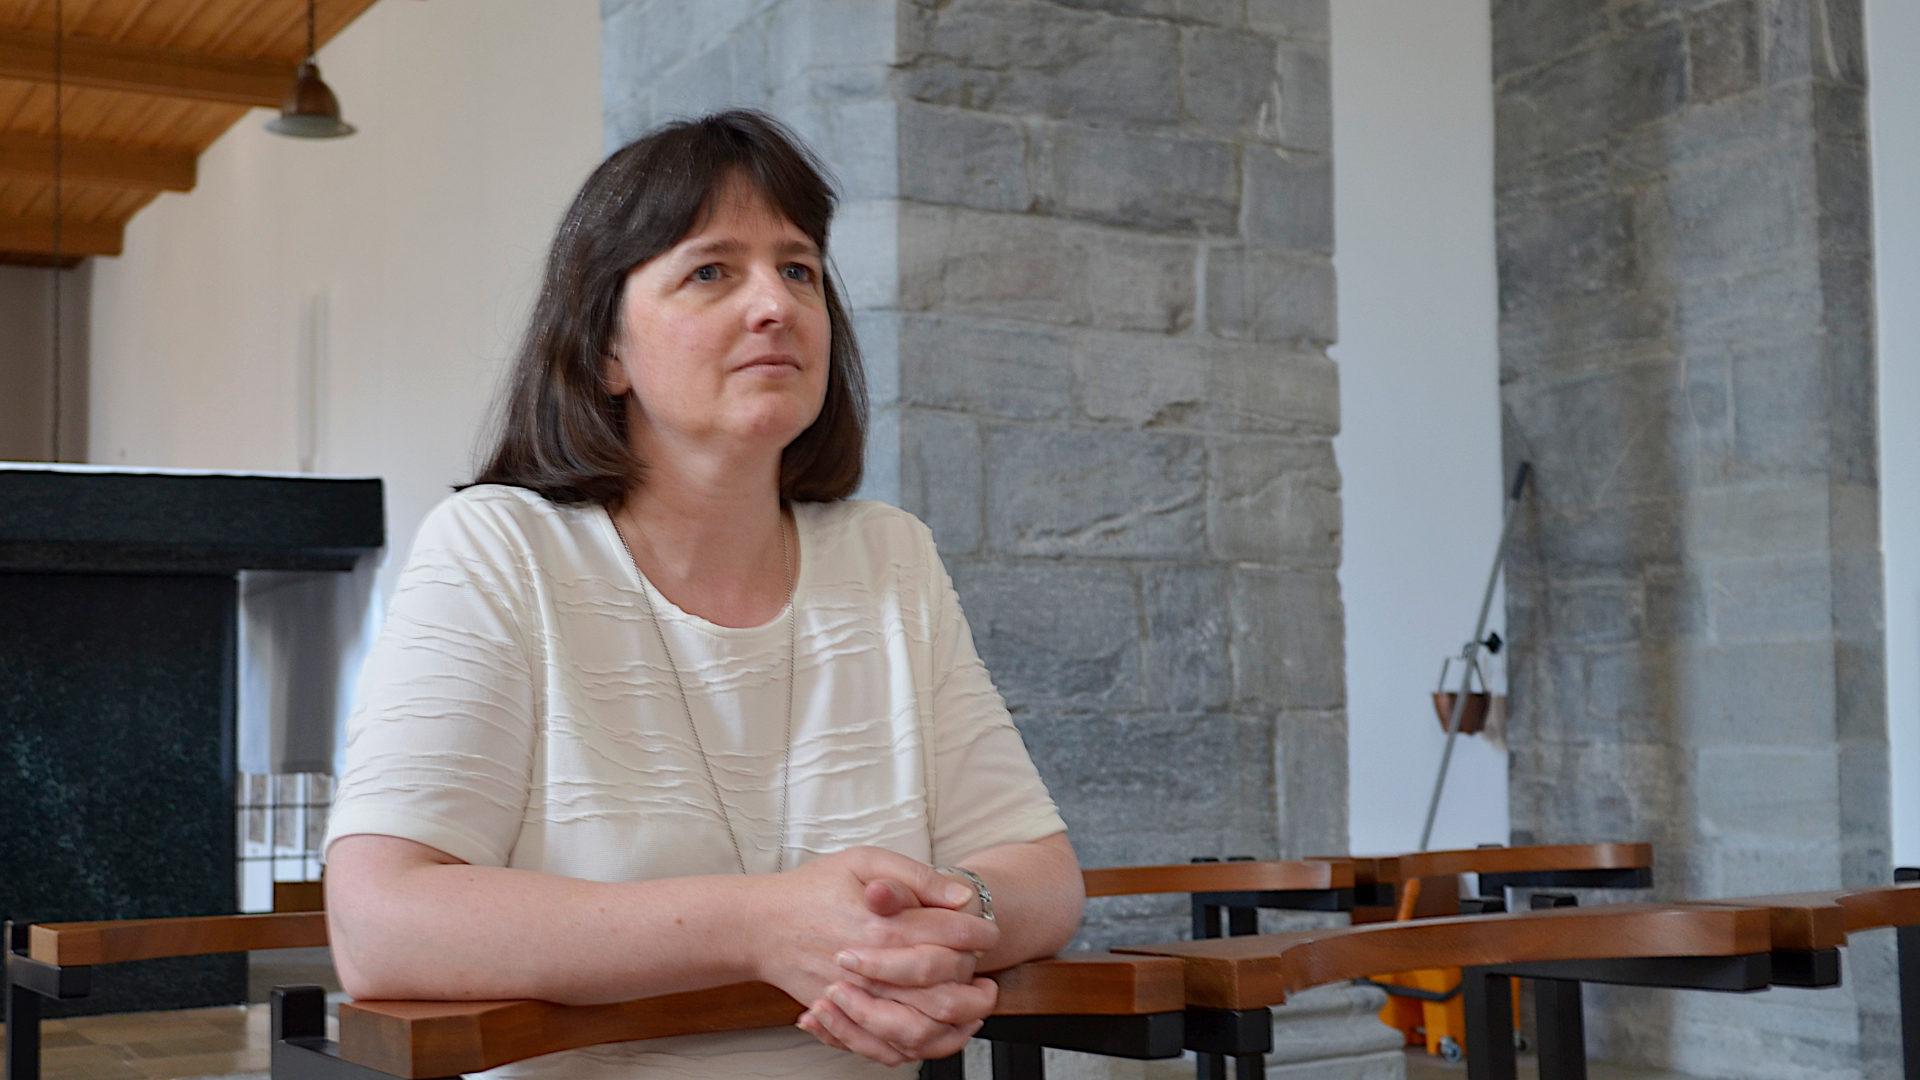 Rosmarie Schärer in der Kirche St. Luzi | © Regula Pfeifer